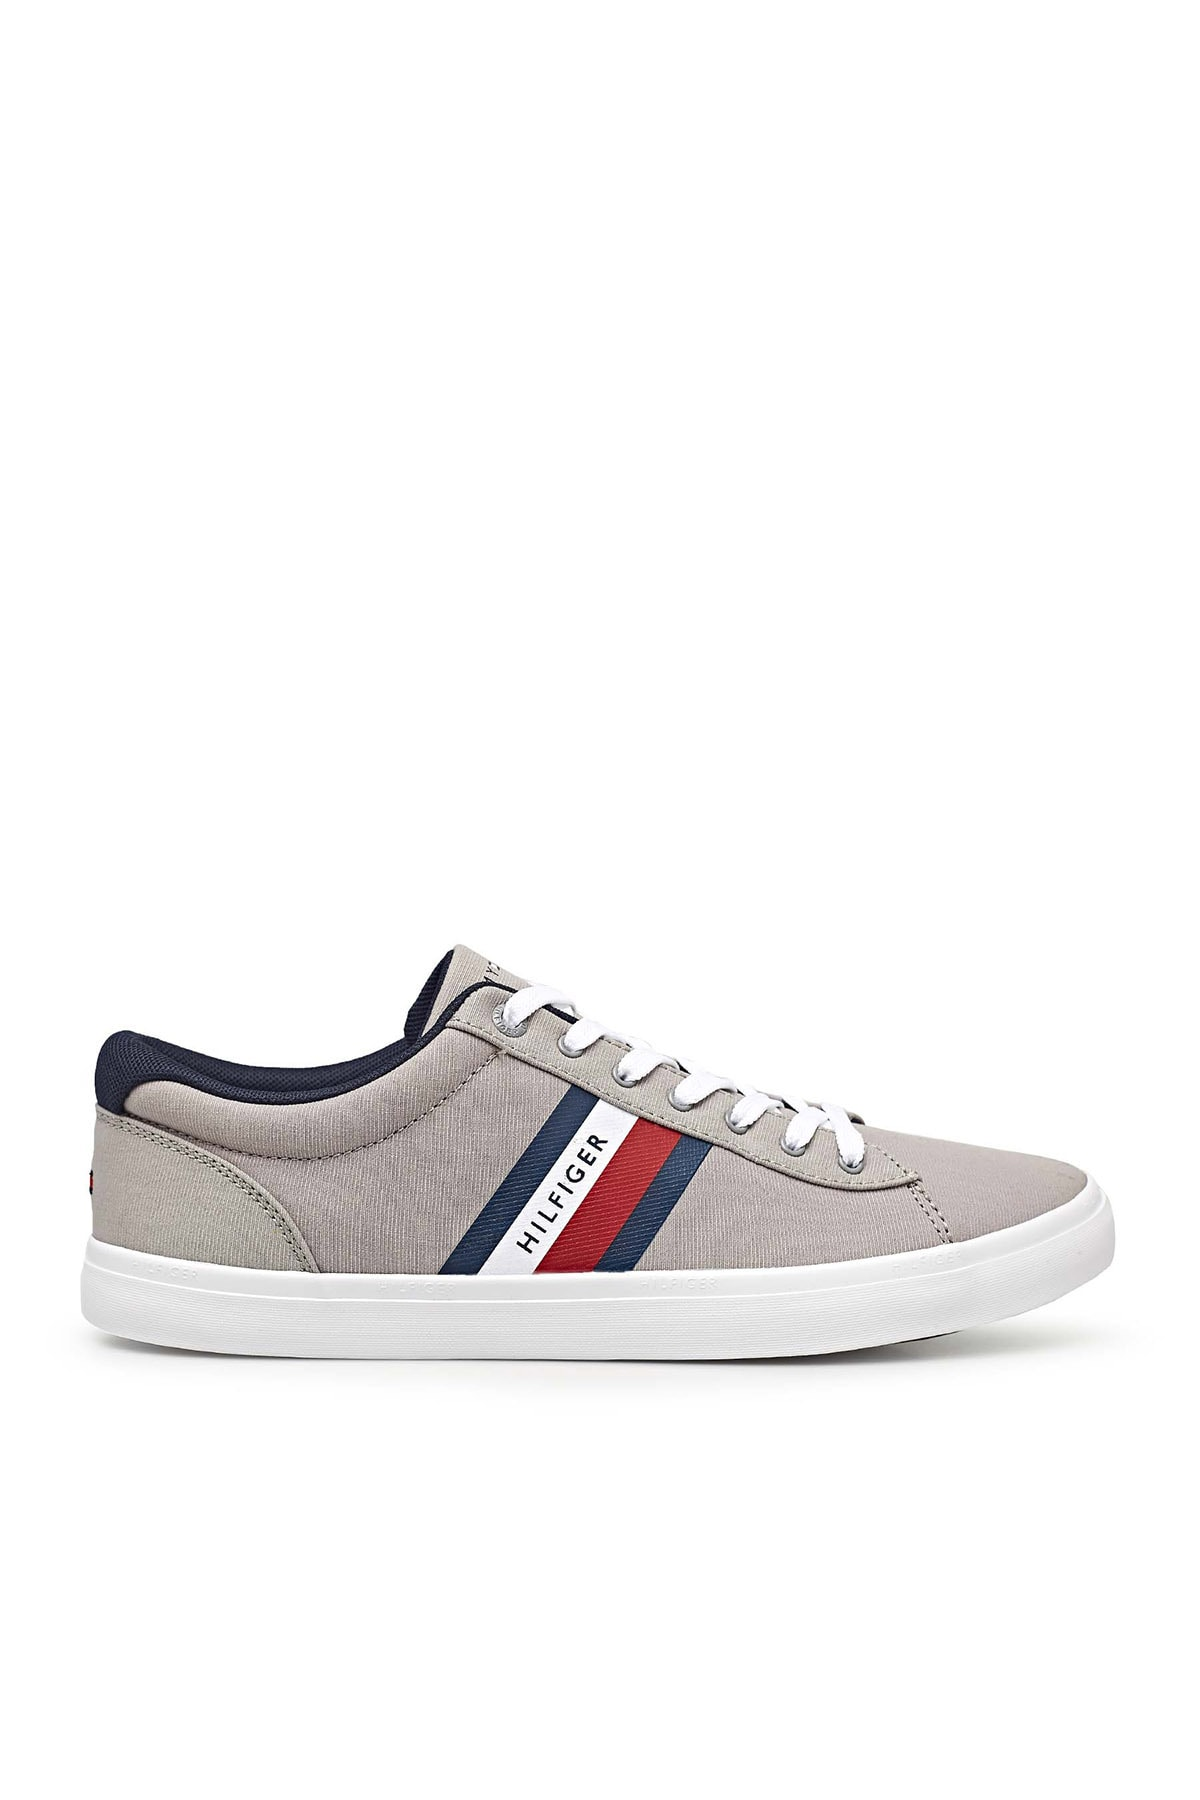 Tommy Hilfiger Erkek Ayakkabı 1